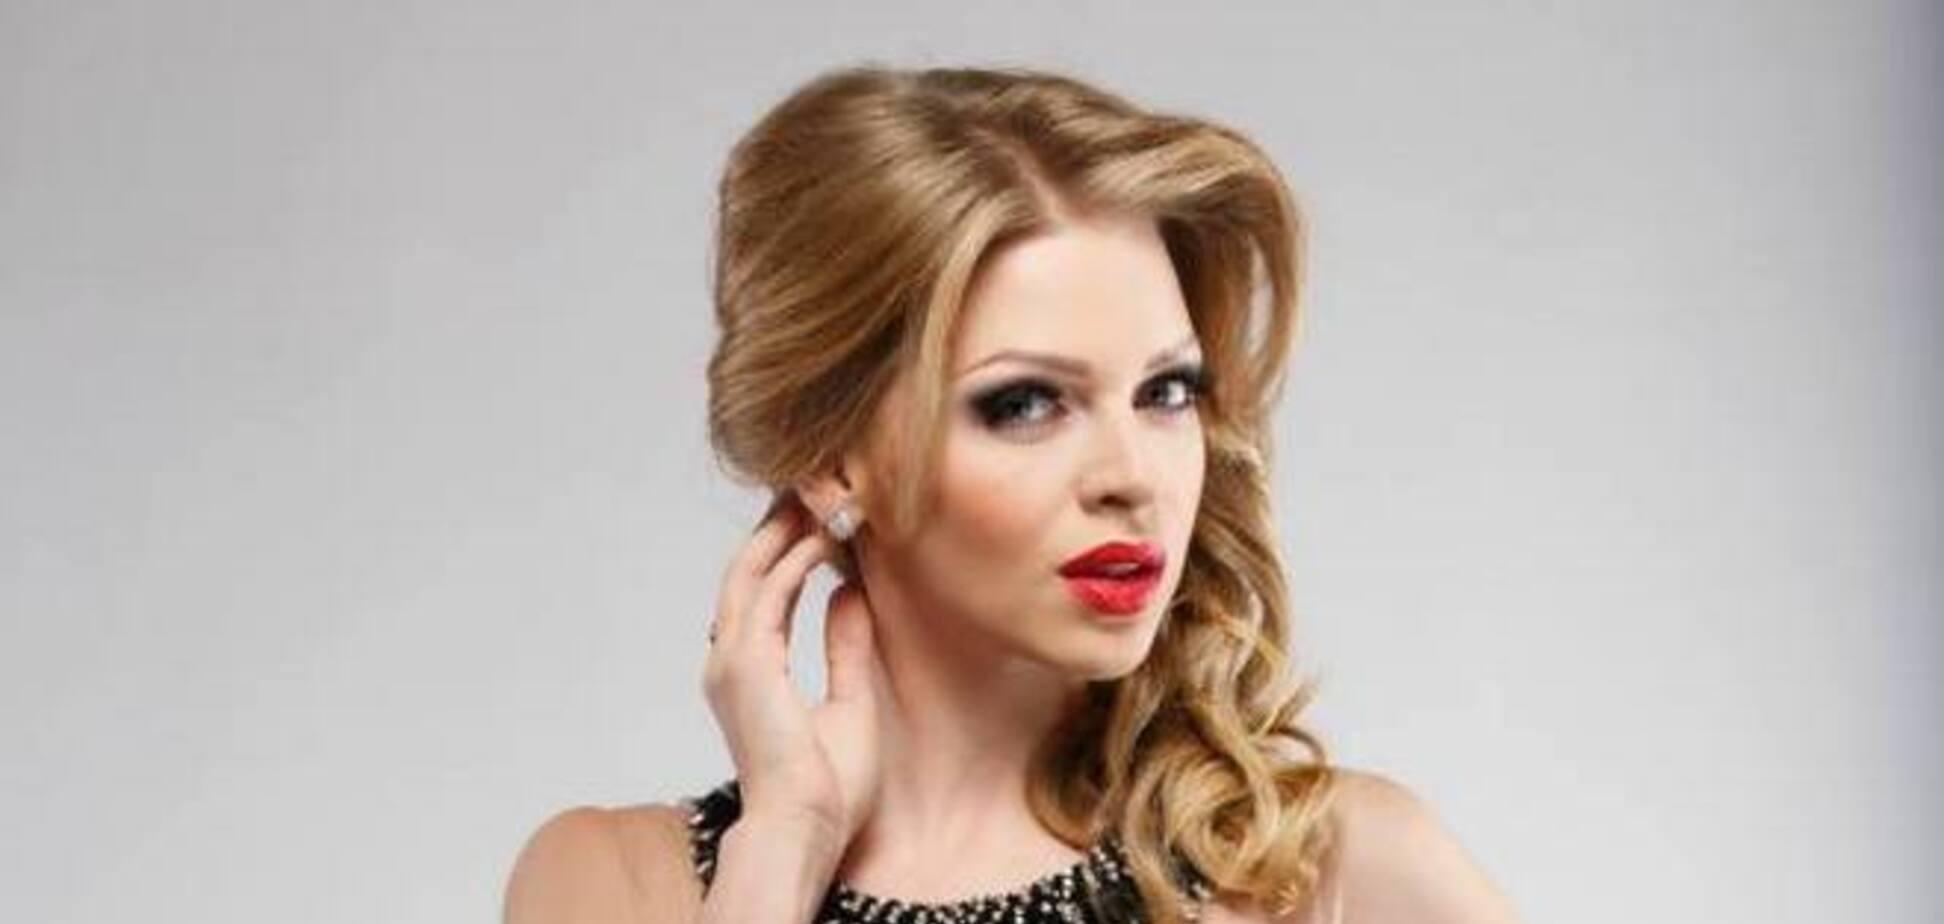 Сексуальна зірка 'Дизель Шоу' потрапила у кліп 'ТІК': як їй це вдалося